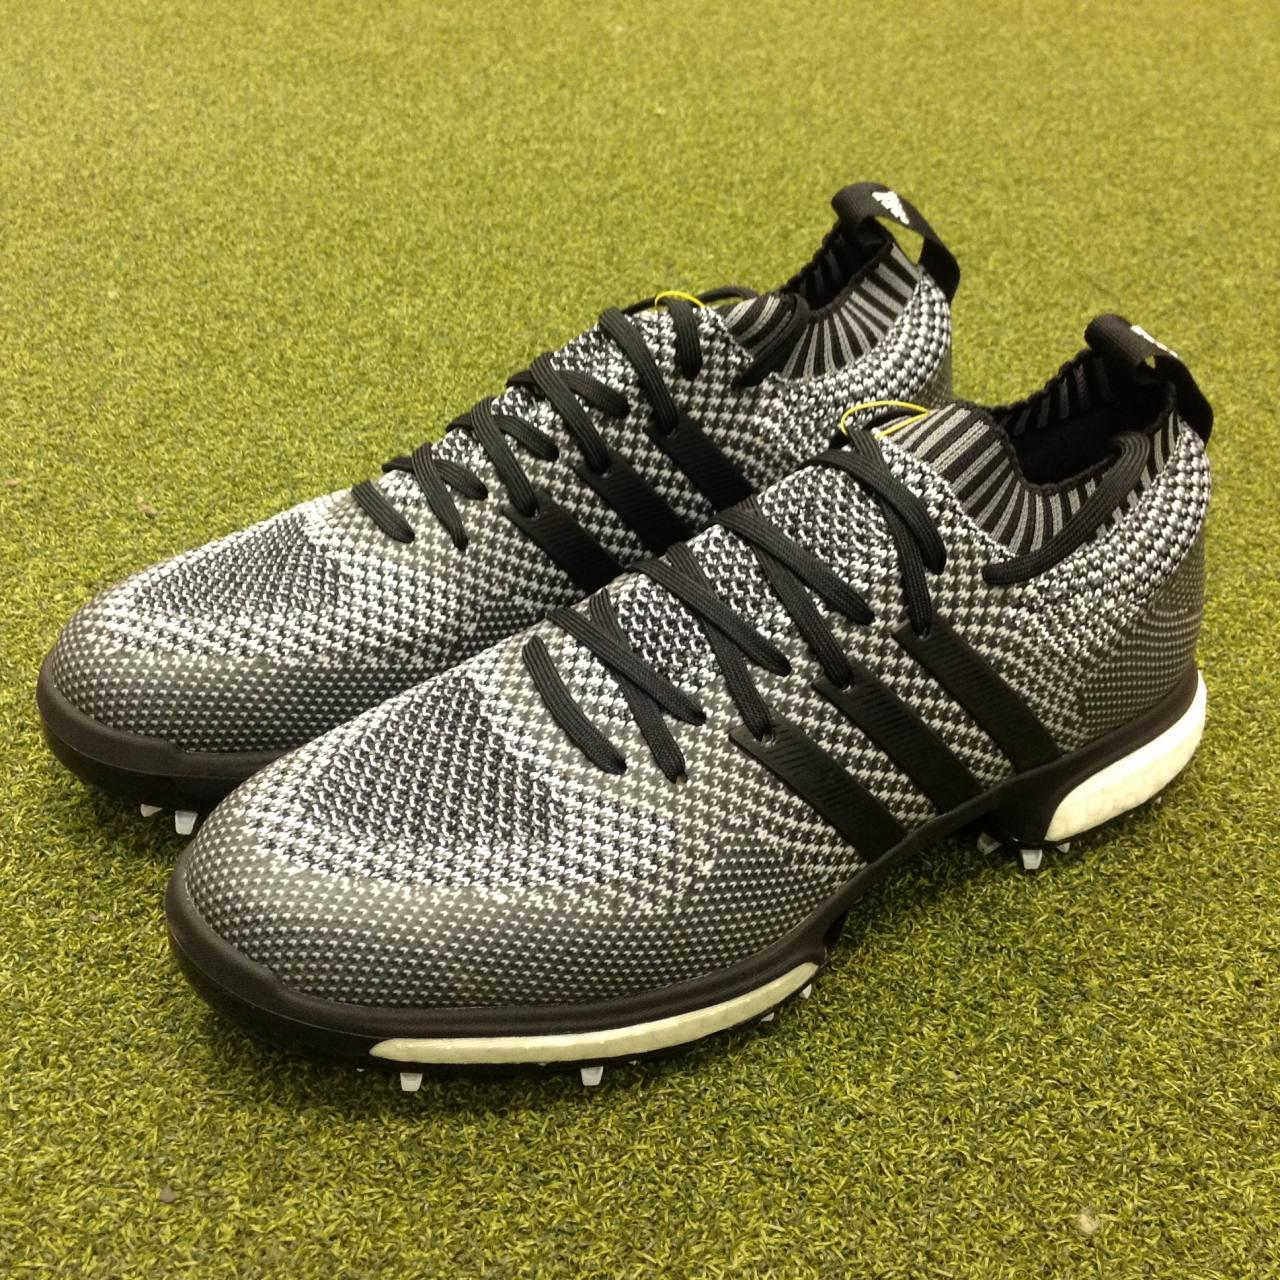 84010b01bc9 Black Adidas Tubular Viral V2 Replica Nike Baseball Cleats